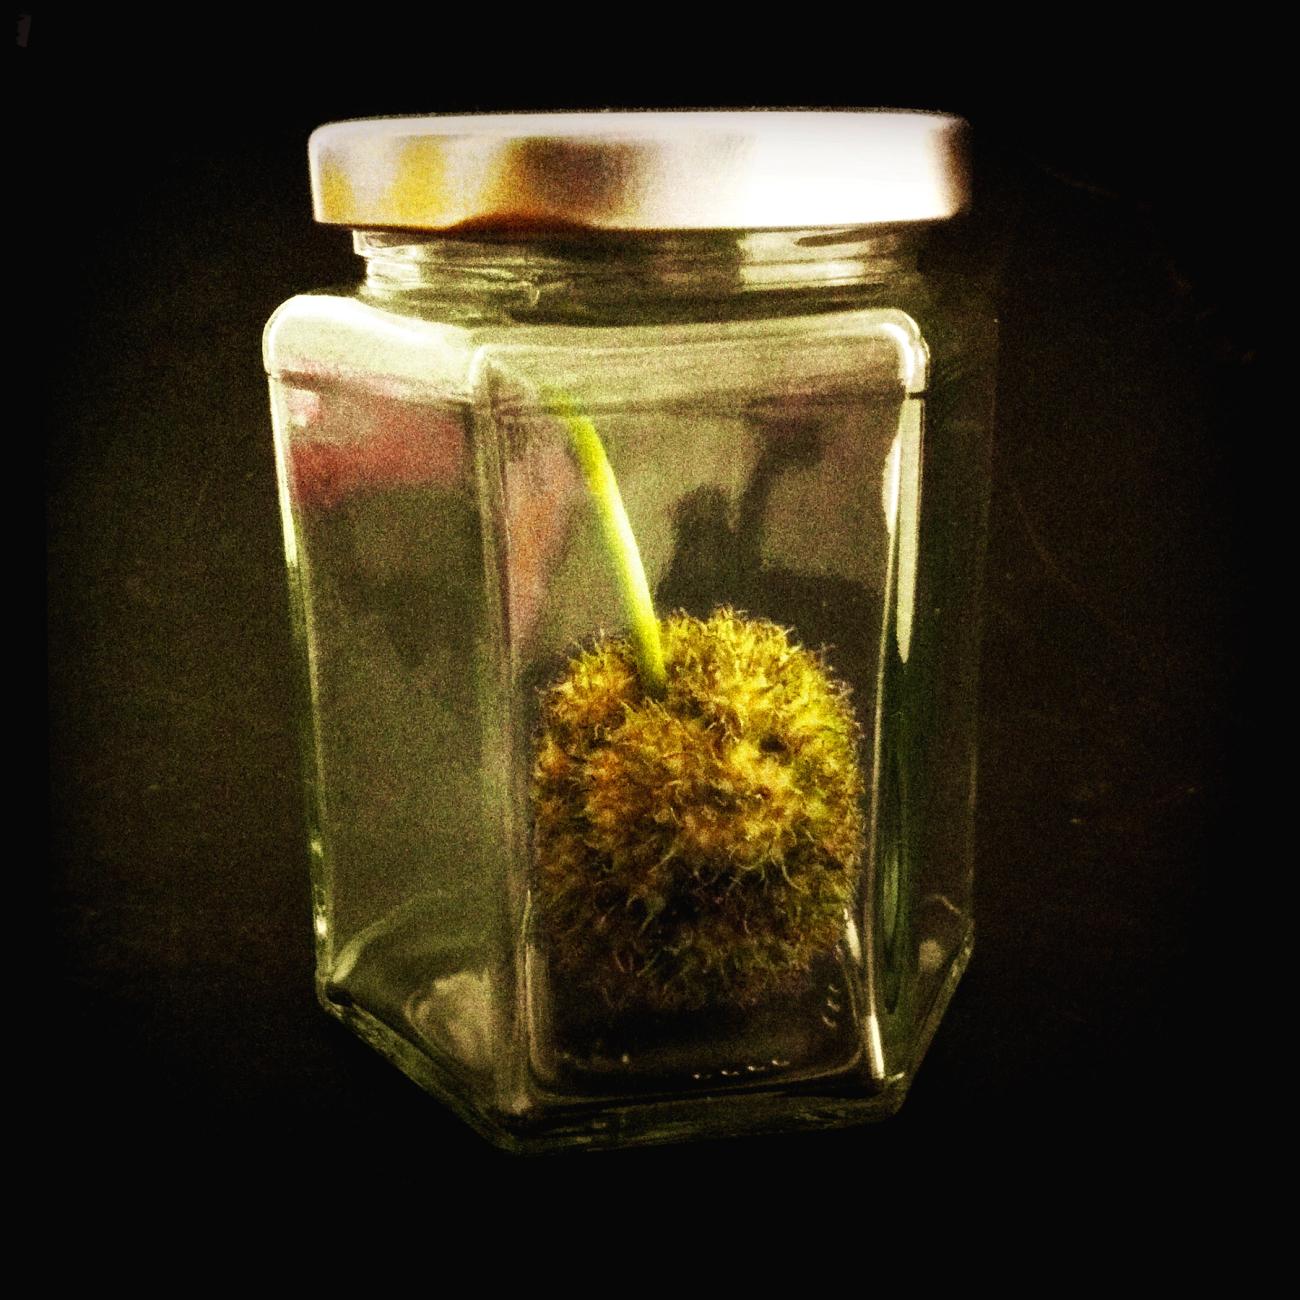 Seedpod in a jam jar